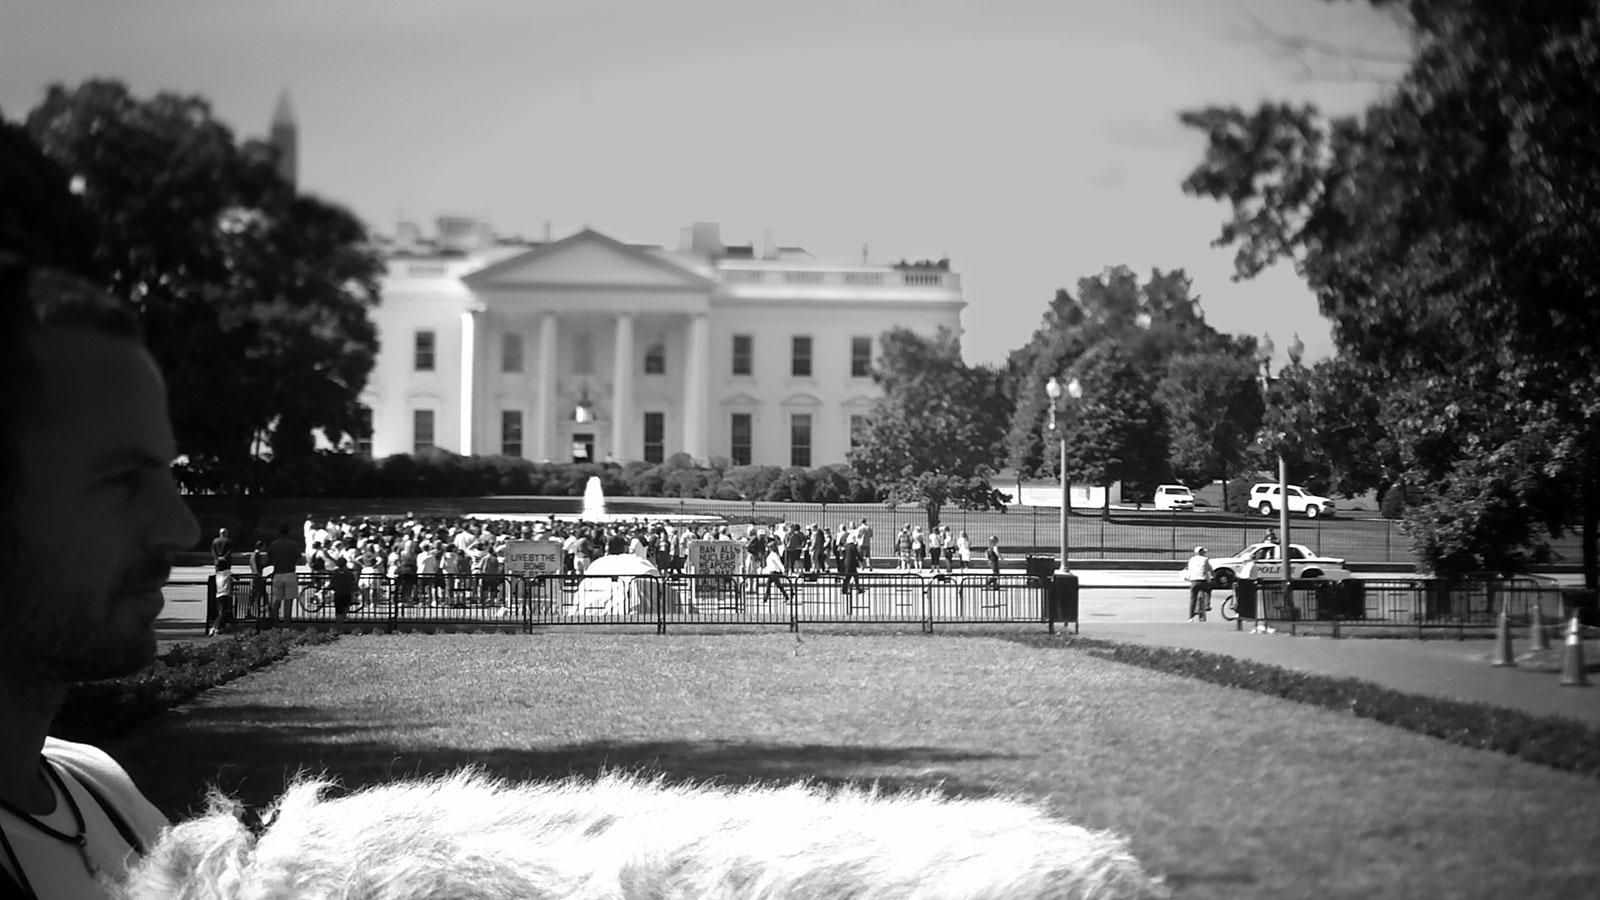 Washington The Sound of power